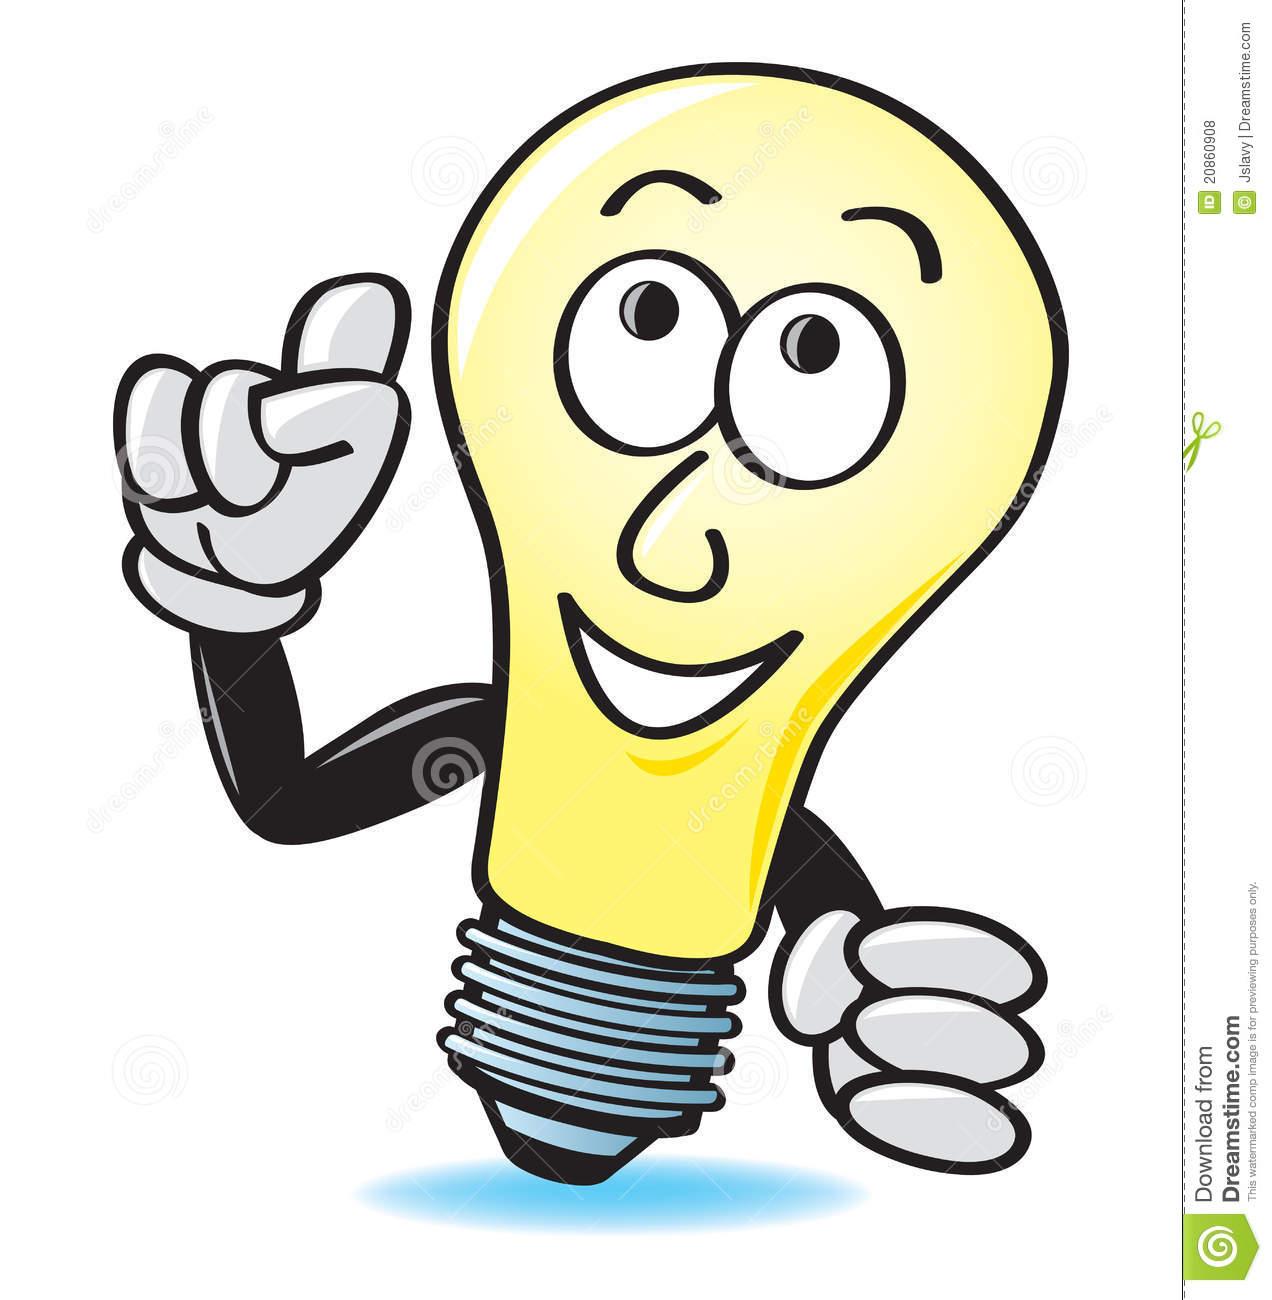 1272x1300 Light Bulb Clipart Smart Light